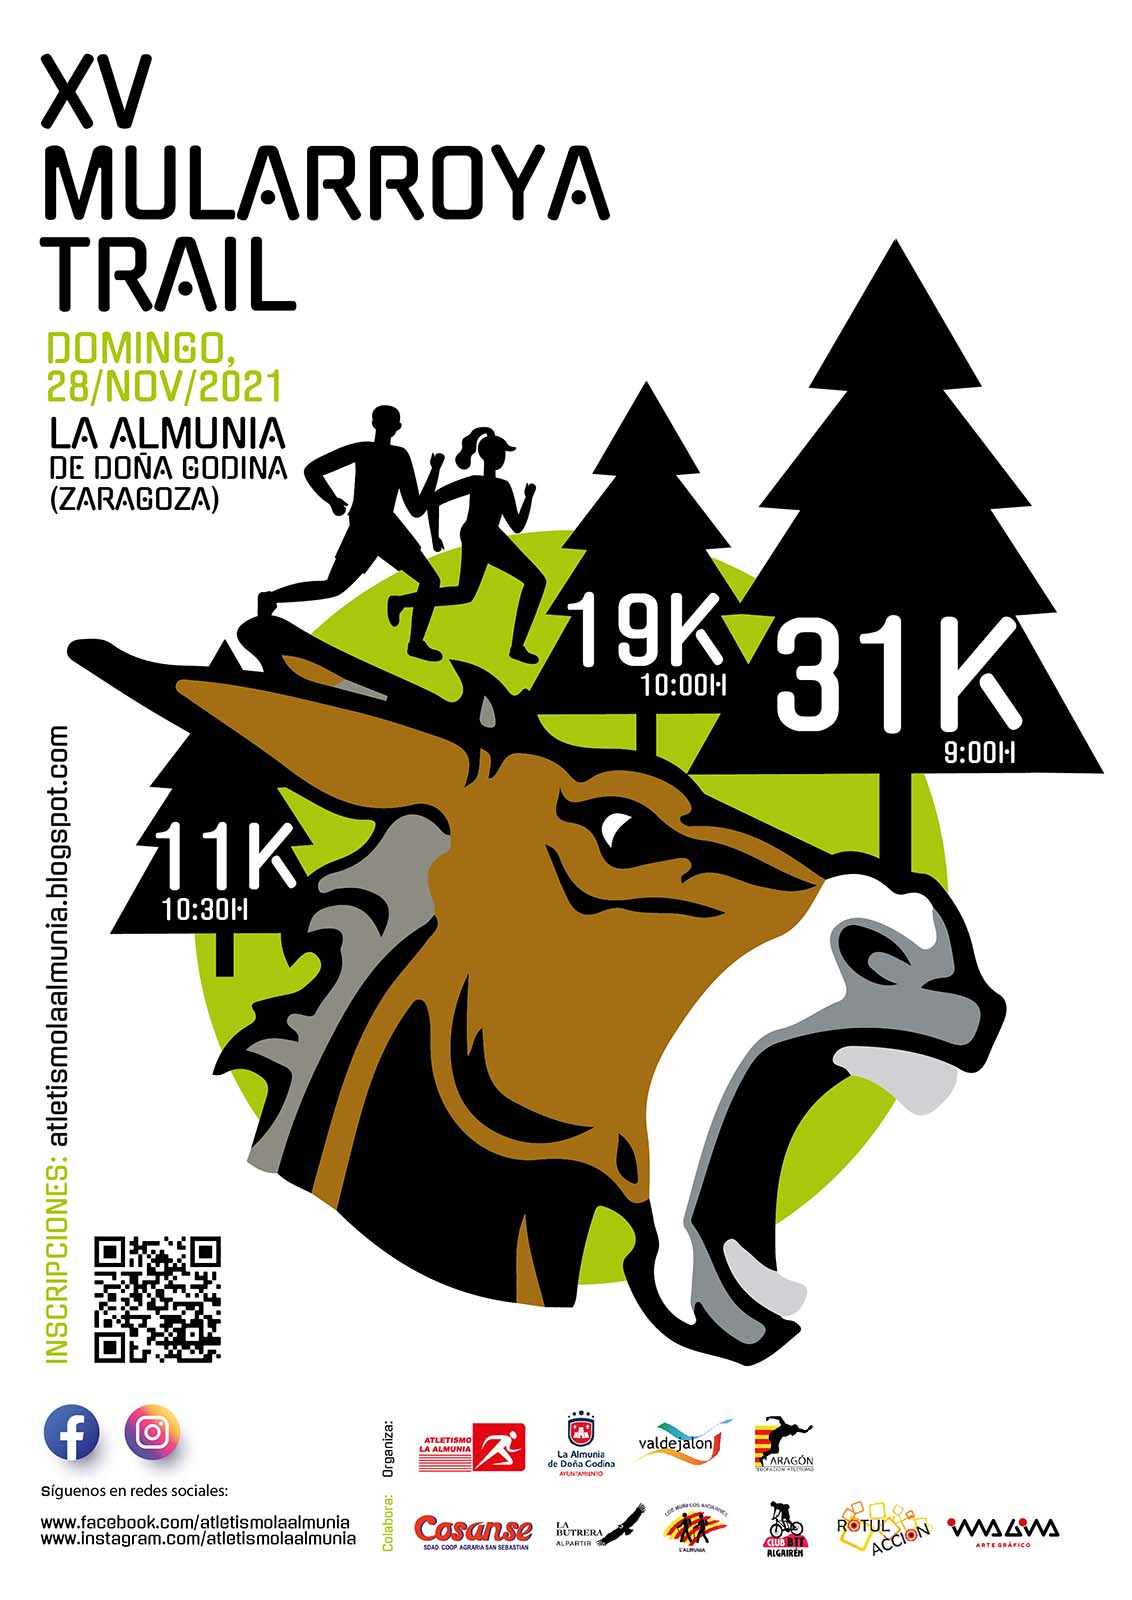 XV Mularroya Trail